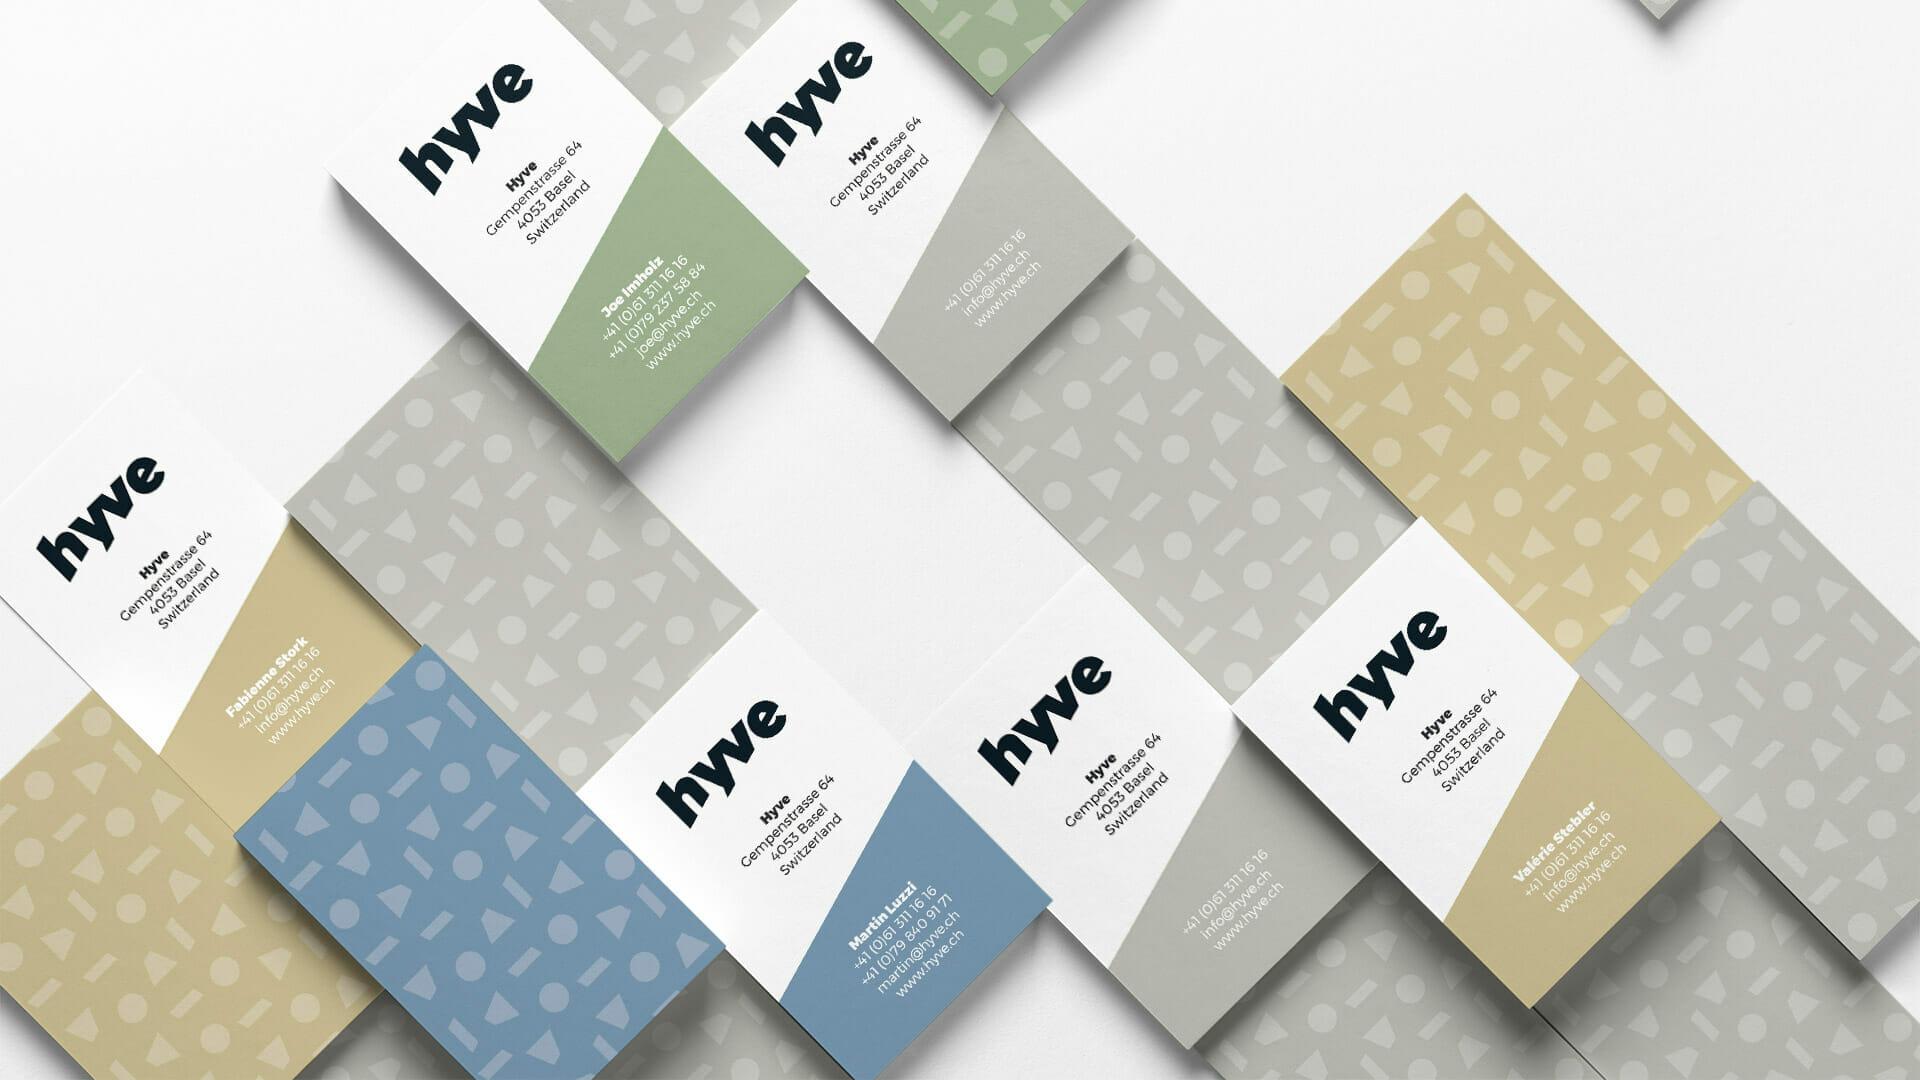 Hyve Sharing Economy Visuelle Fabrik